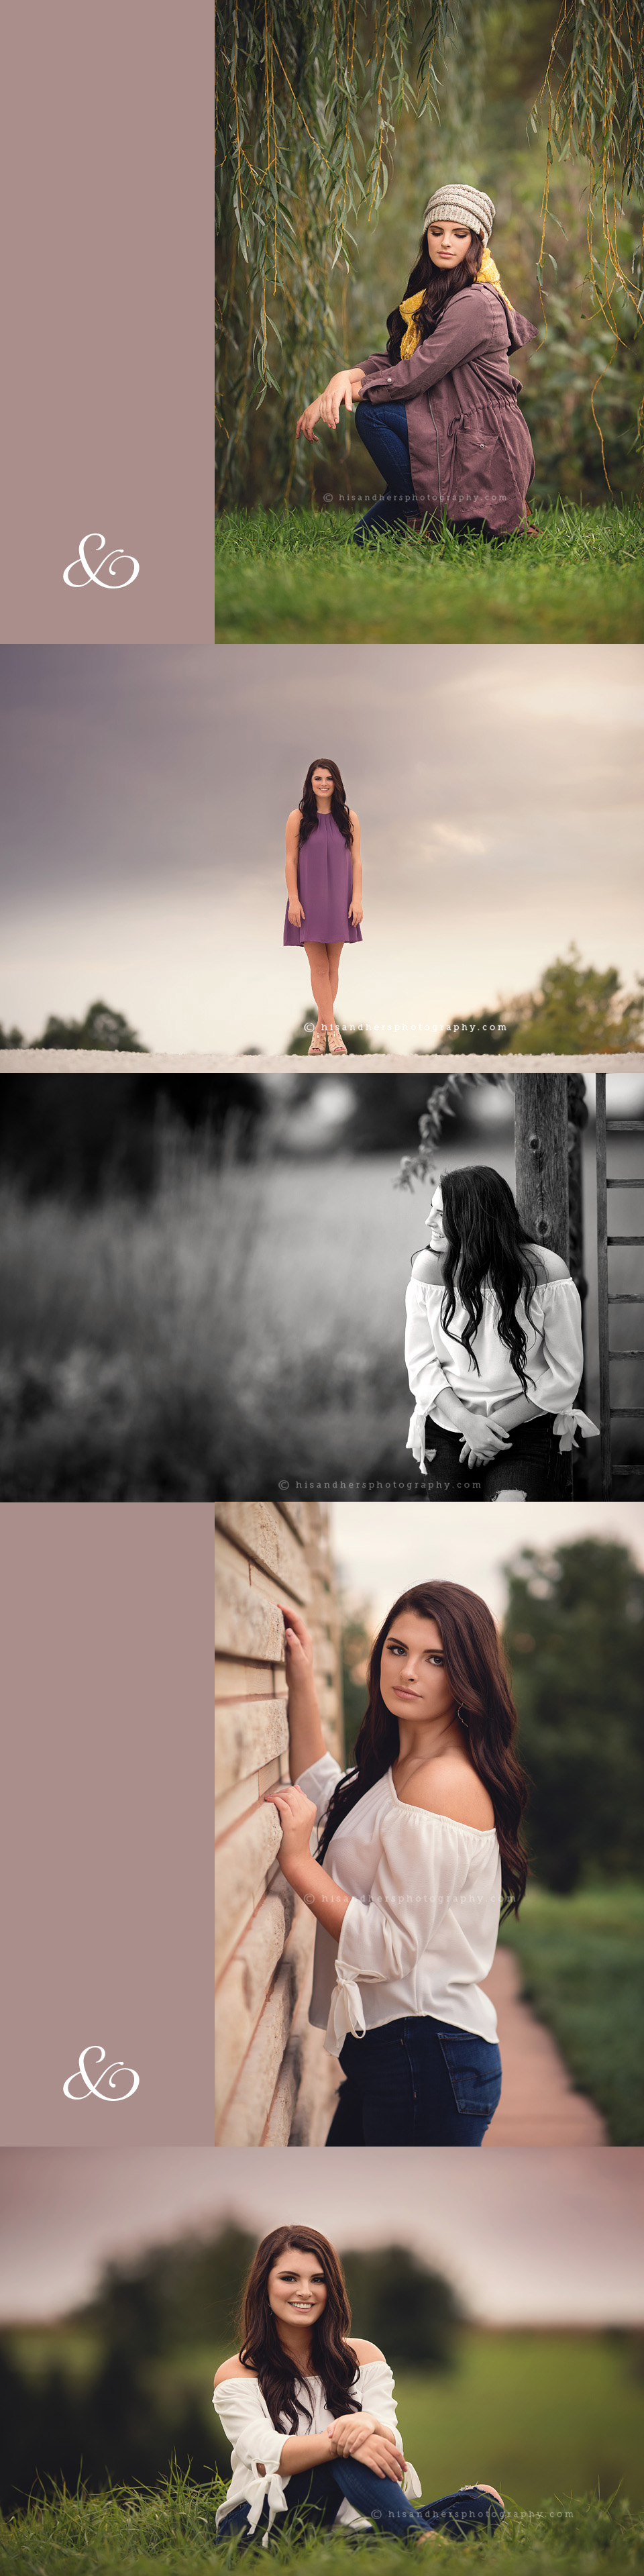 iowa high school senior pictures senior portraits photographer des moines high school seniors class of 2019 2020 2021